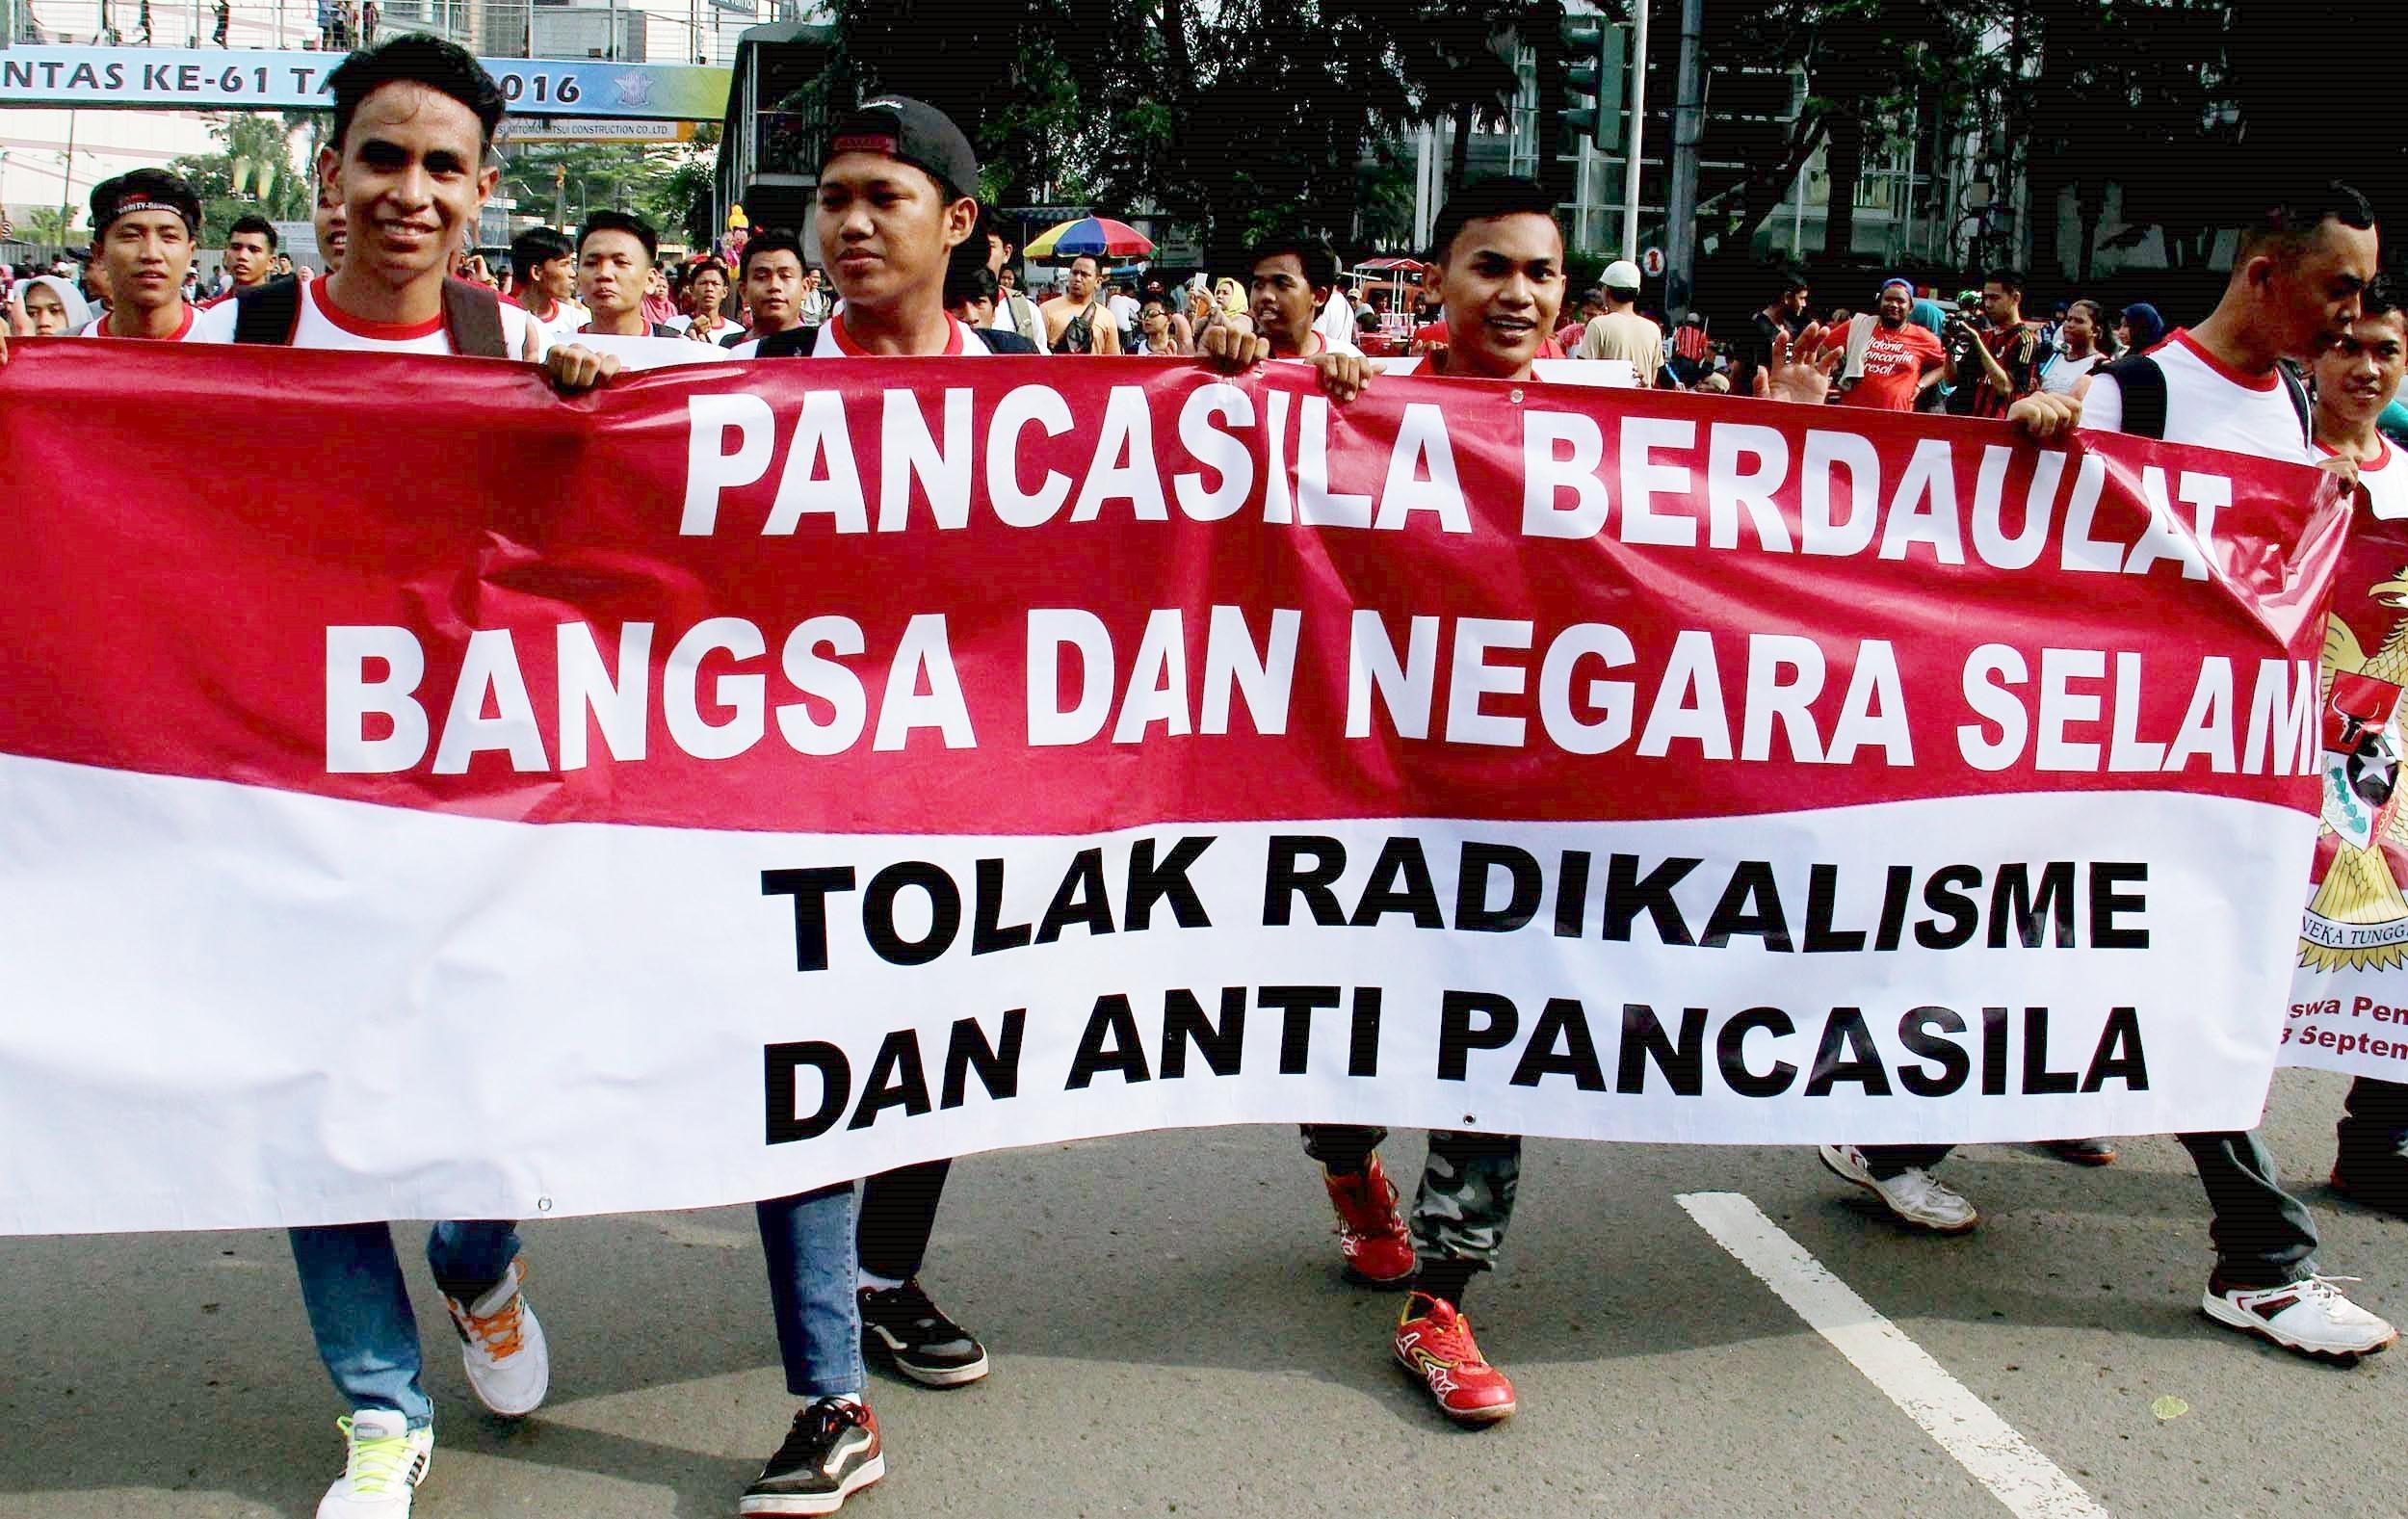 Strategi Mencegah Paham Radikalisme Dan Terorisme Halaman All Kompasiana Com